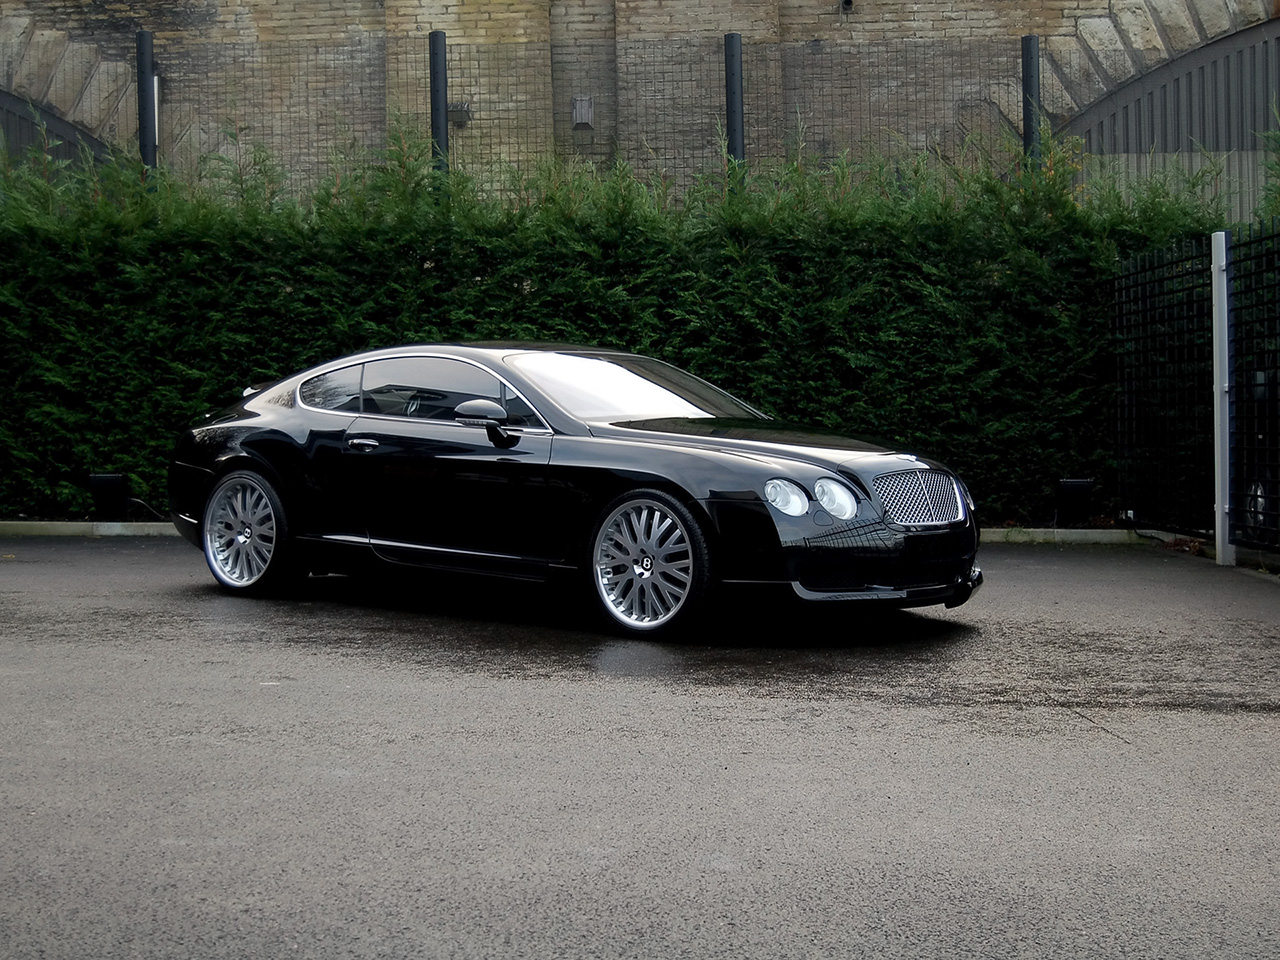 http://4.bp.blogspot.com/-gql-jz7YwNE/TzdRLJjhx6I/AAAAAAAABnY/58ex9TwpIbY/s1600/Bentley+Continental+GT+Wallpapers-4.jpg